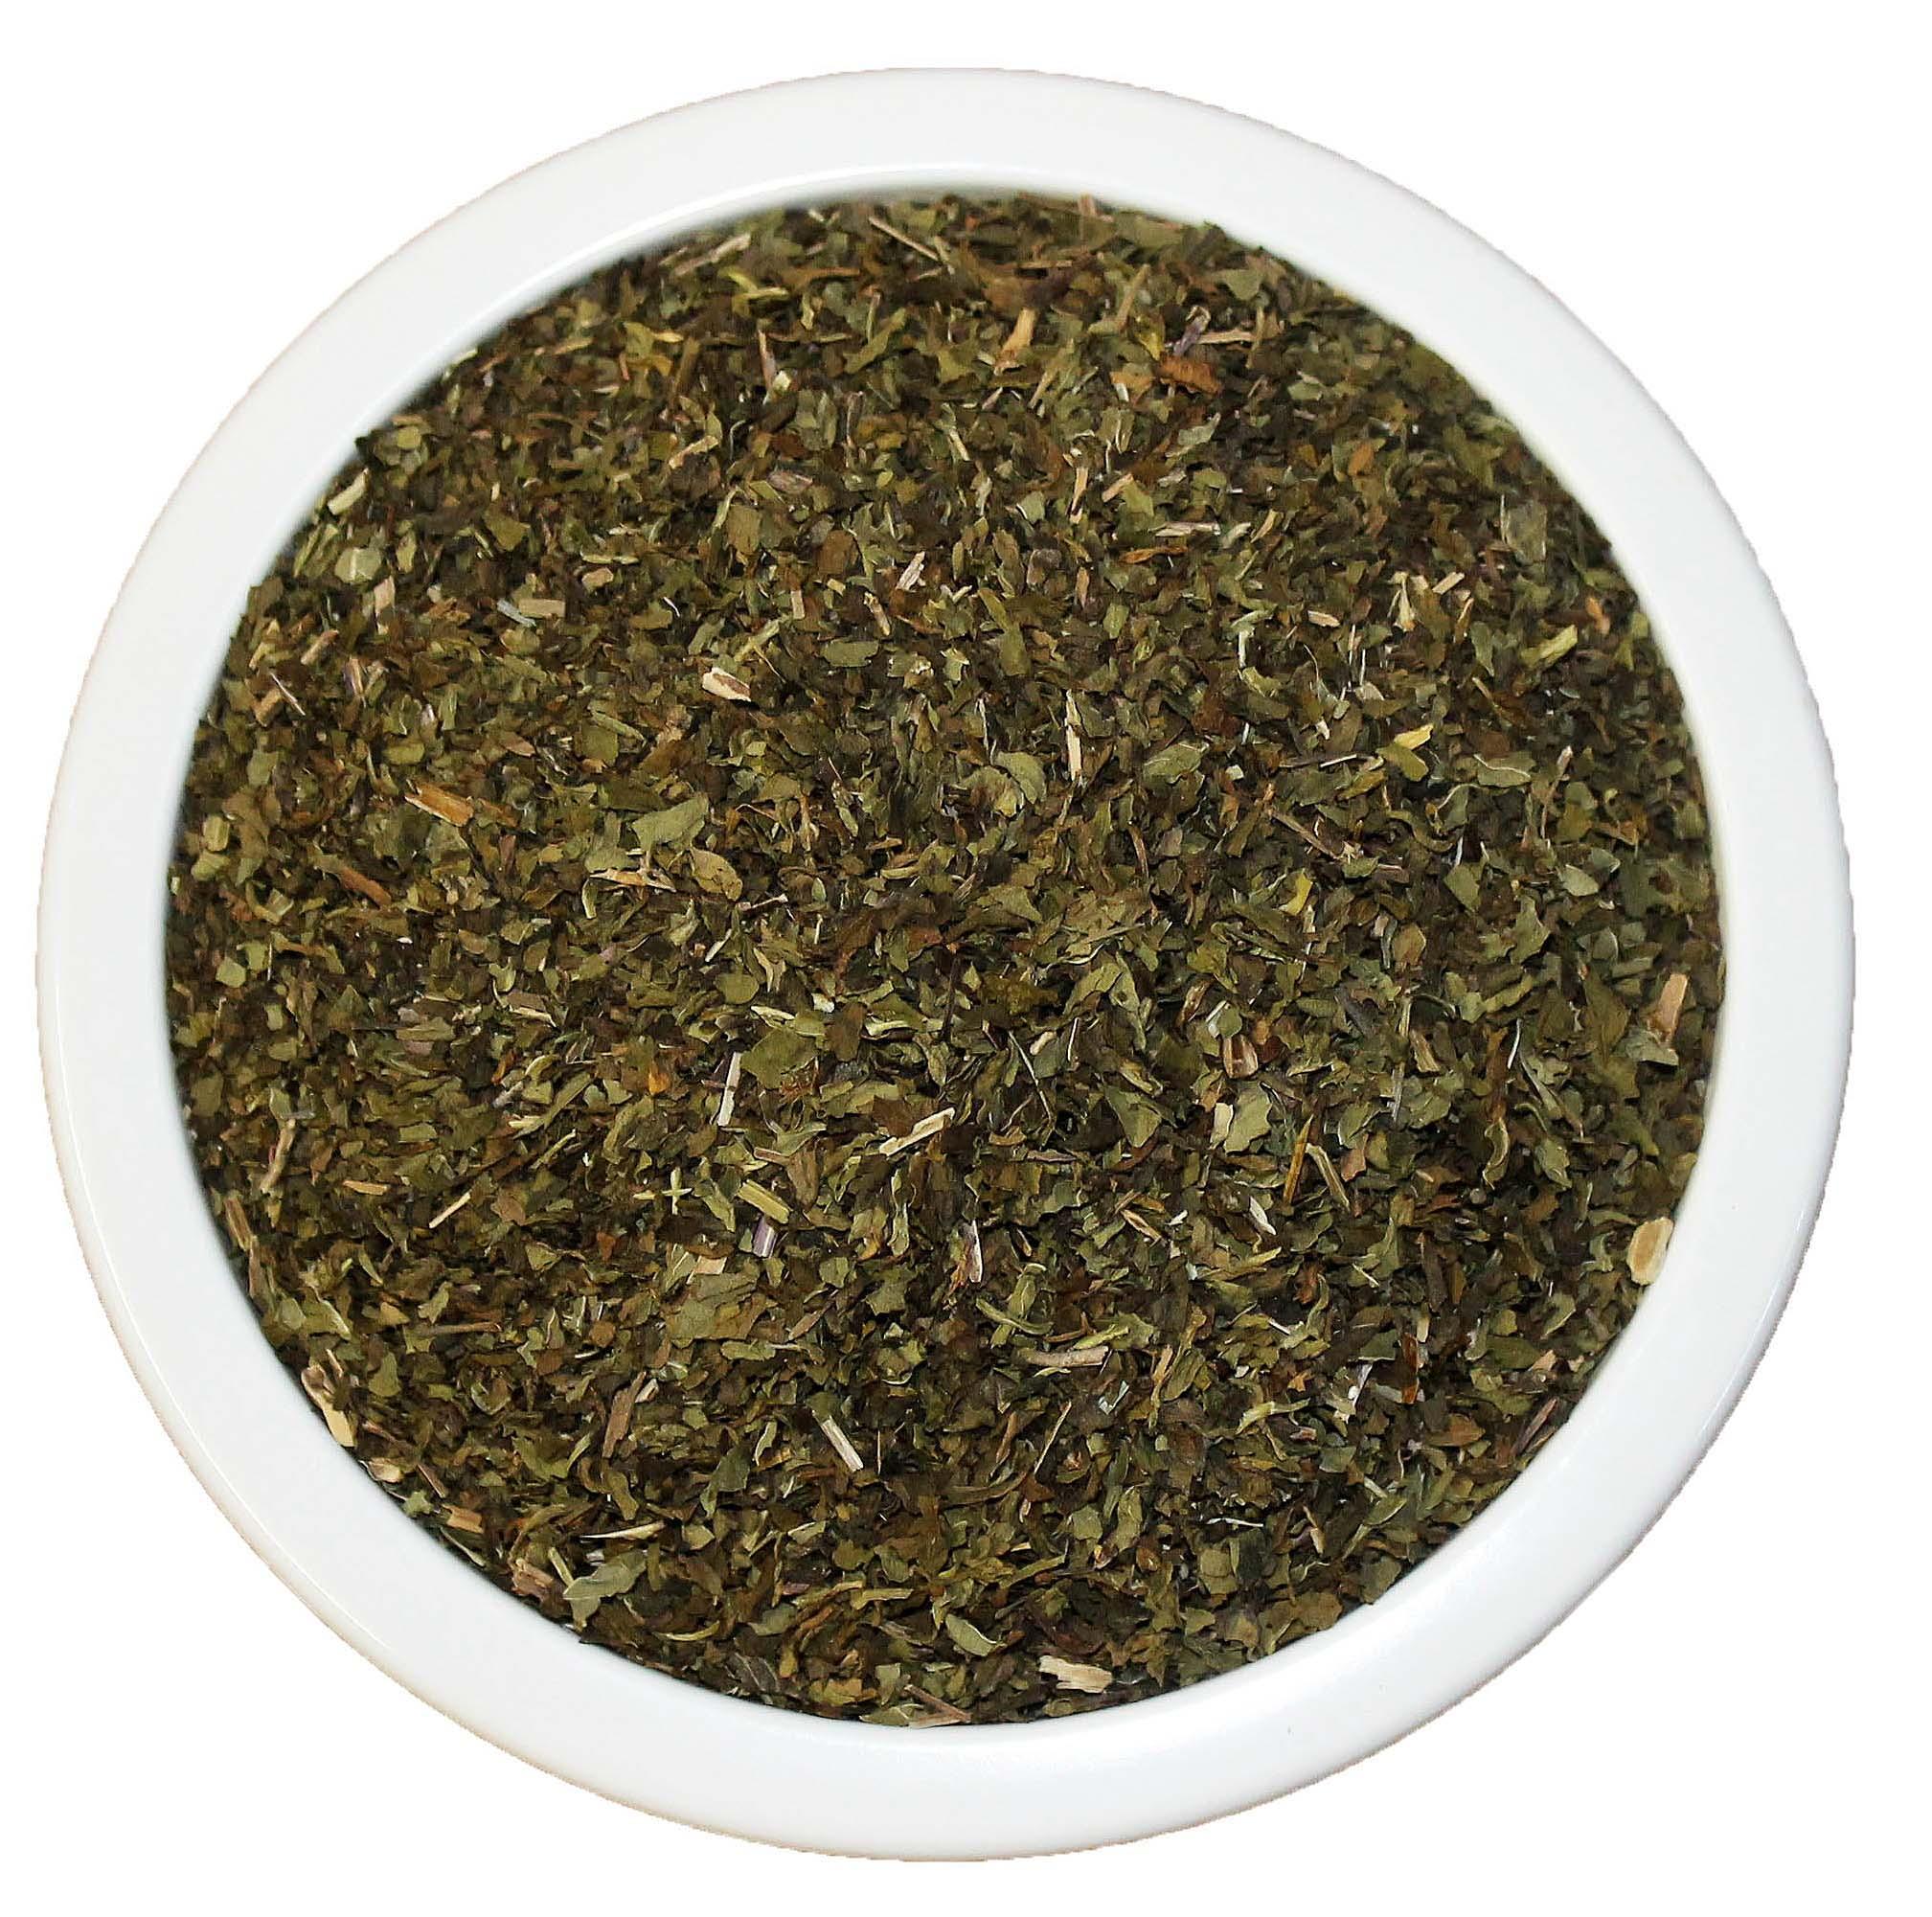 Minze Nanaminze gerebelt 100 g Minztee keimreduziert Tee 1A PEnandiTRA ®